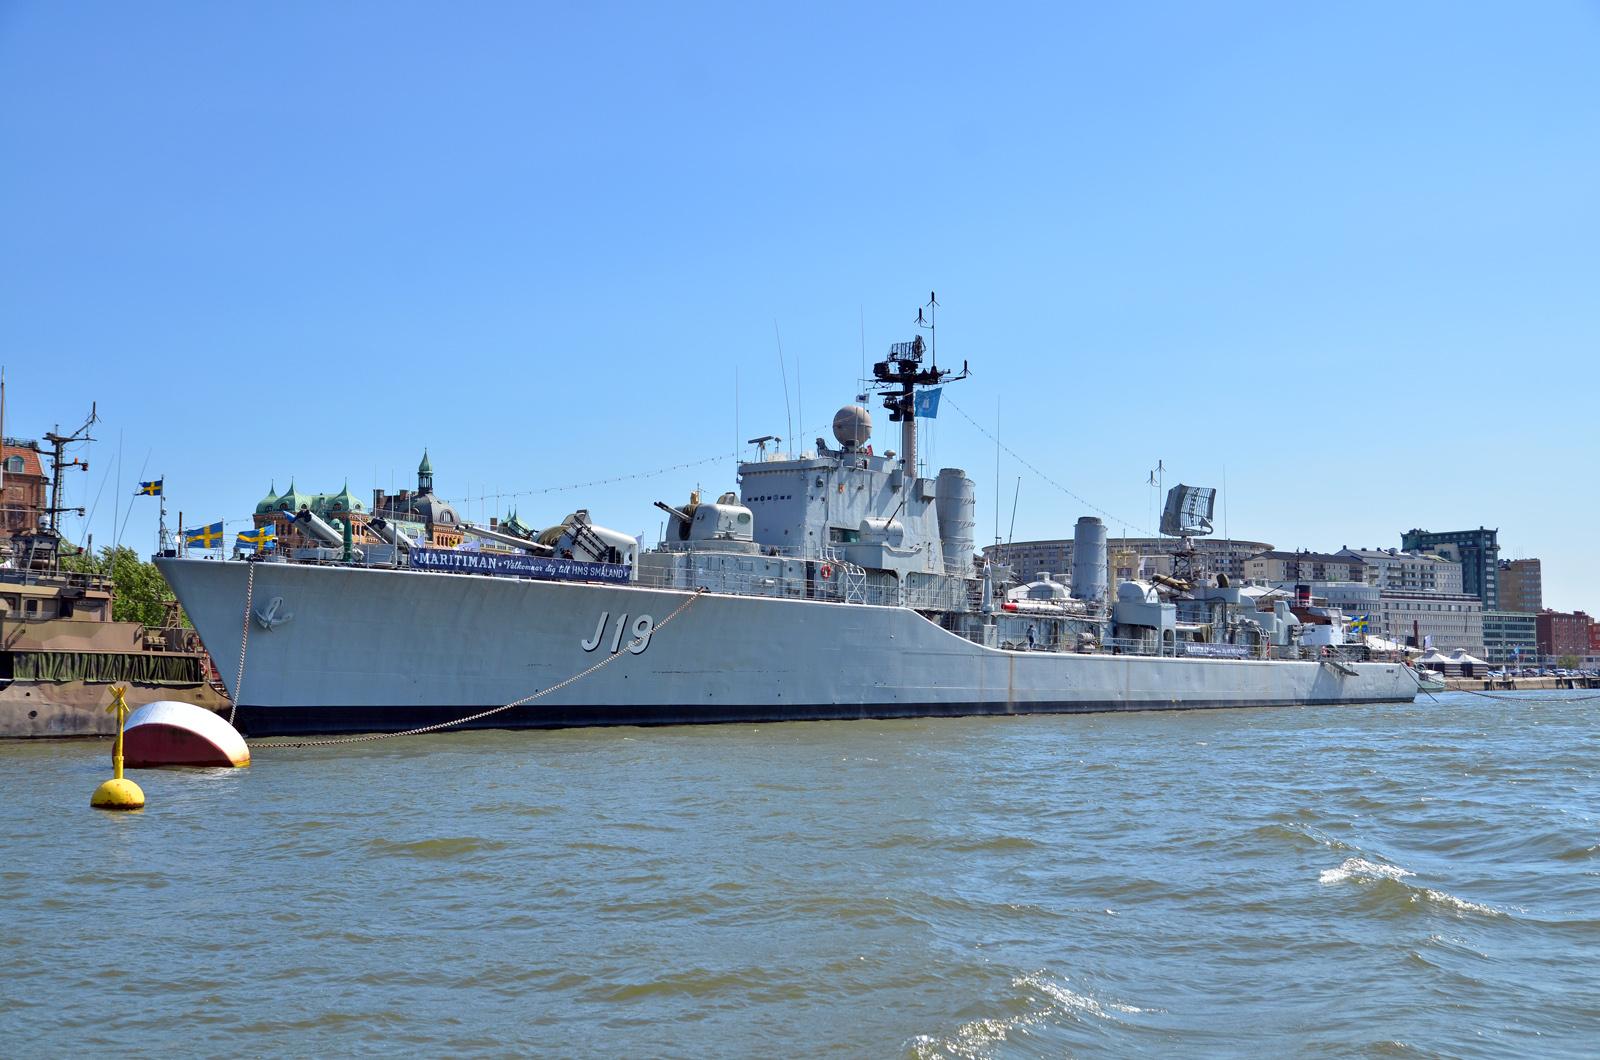 Added HSwMS Småland (J19)